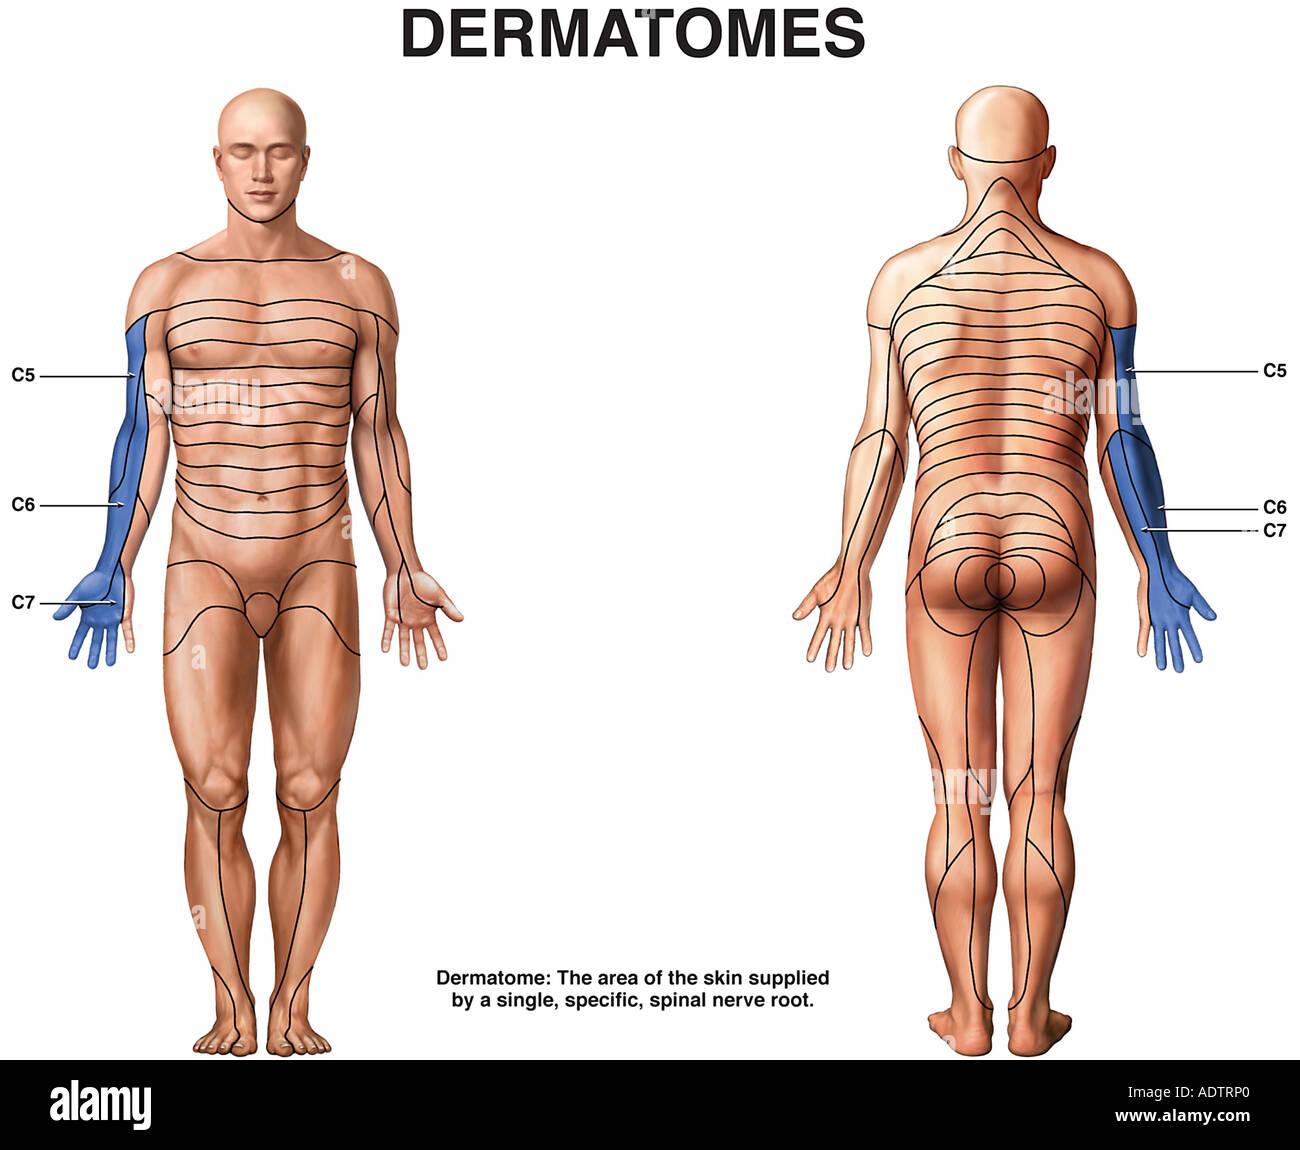 Dermatomas Foto & Imagen De Stock: 7710111 - Alamy